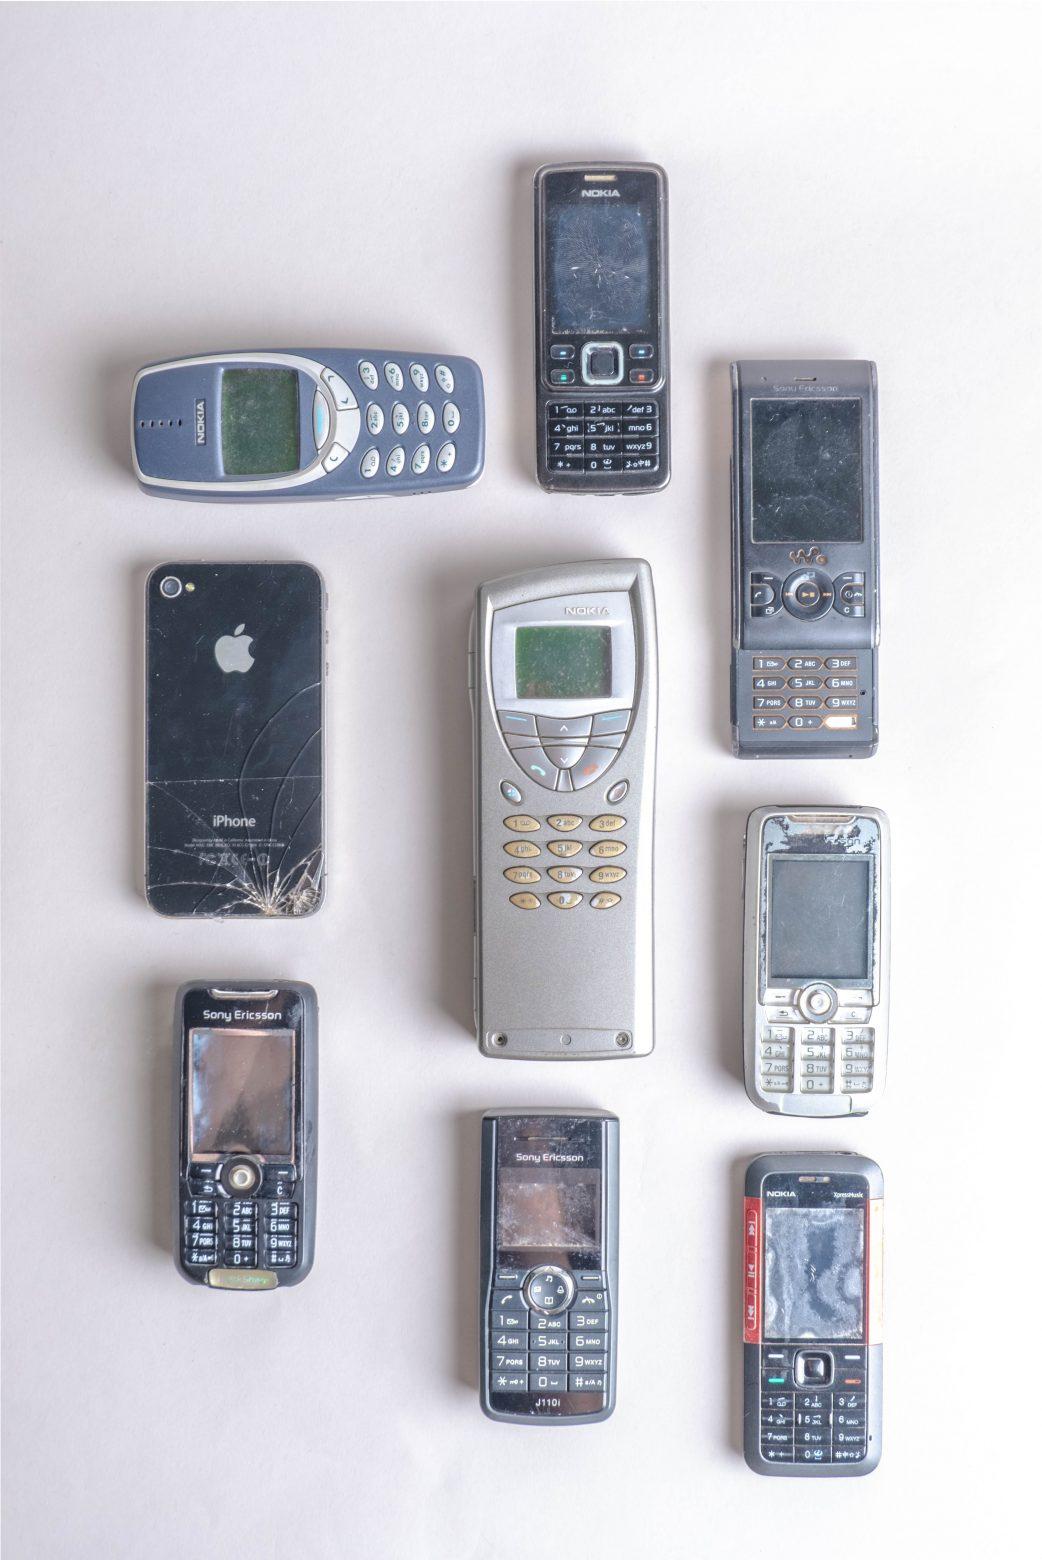 Antech: Τα «αρχαία» τηλέφωνα που κοστίζουν χιλιάδες ευρώ